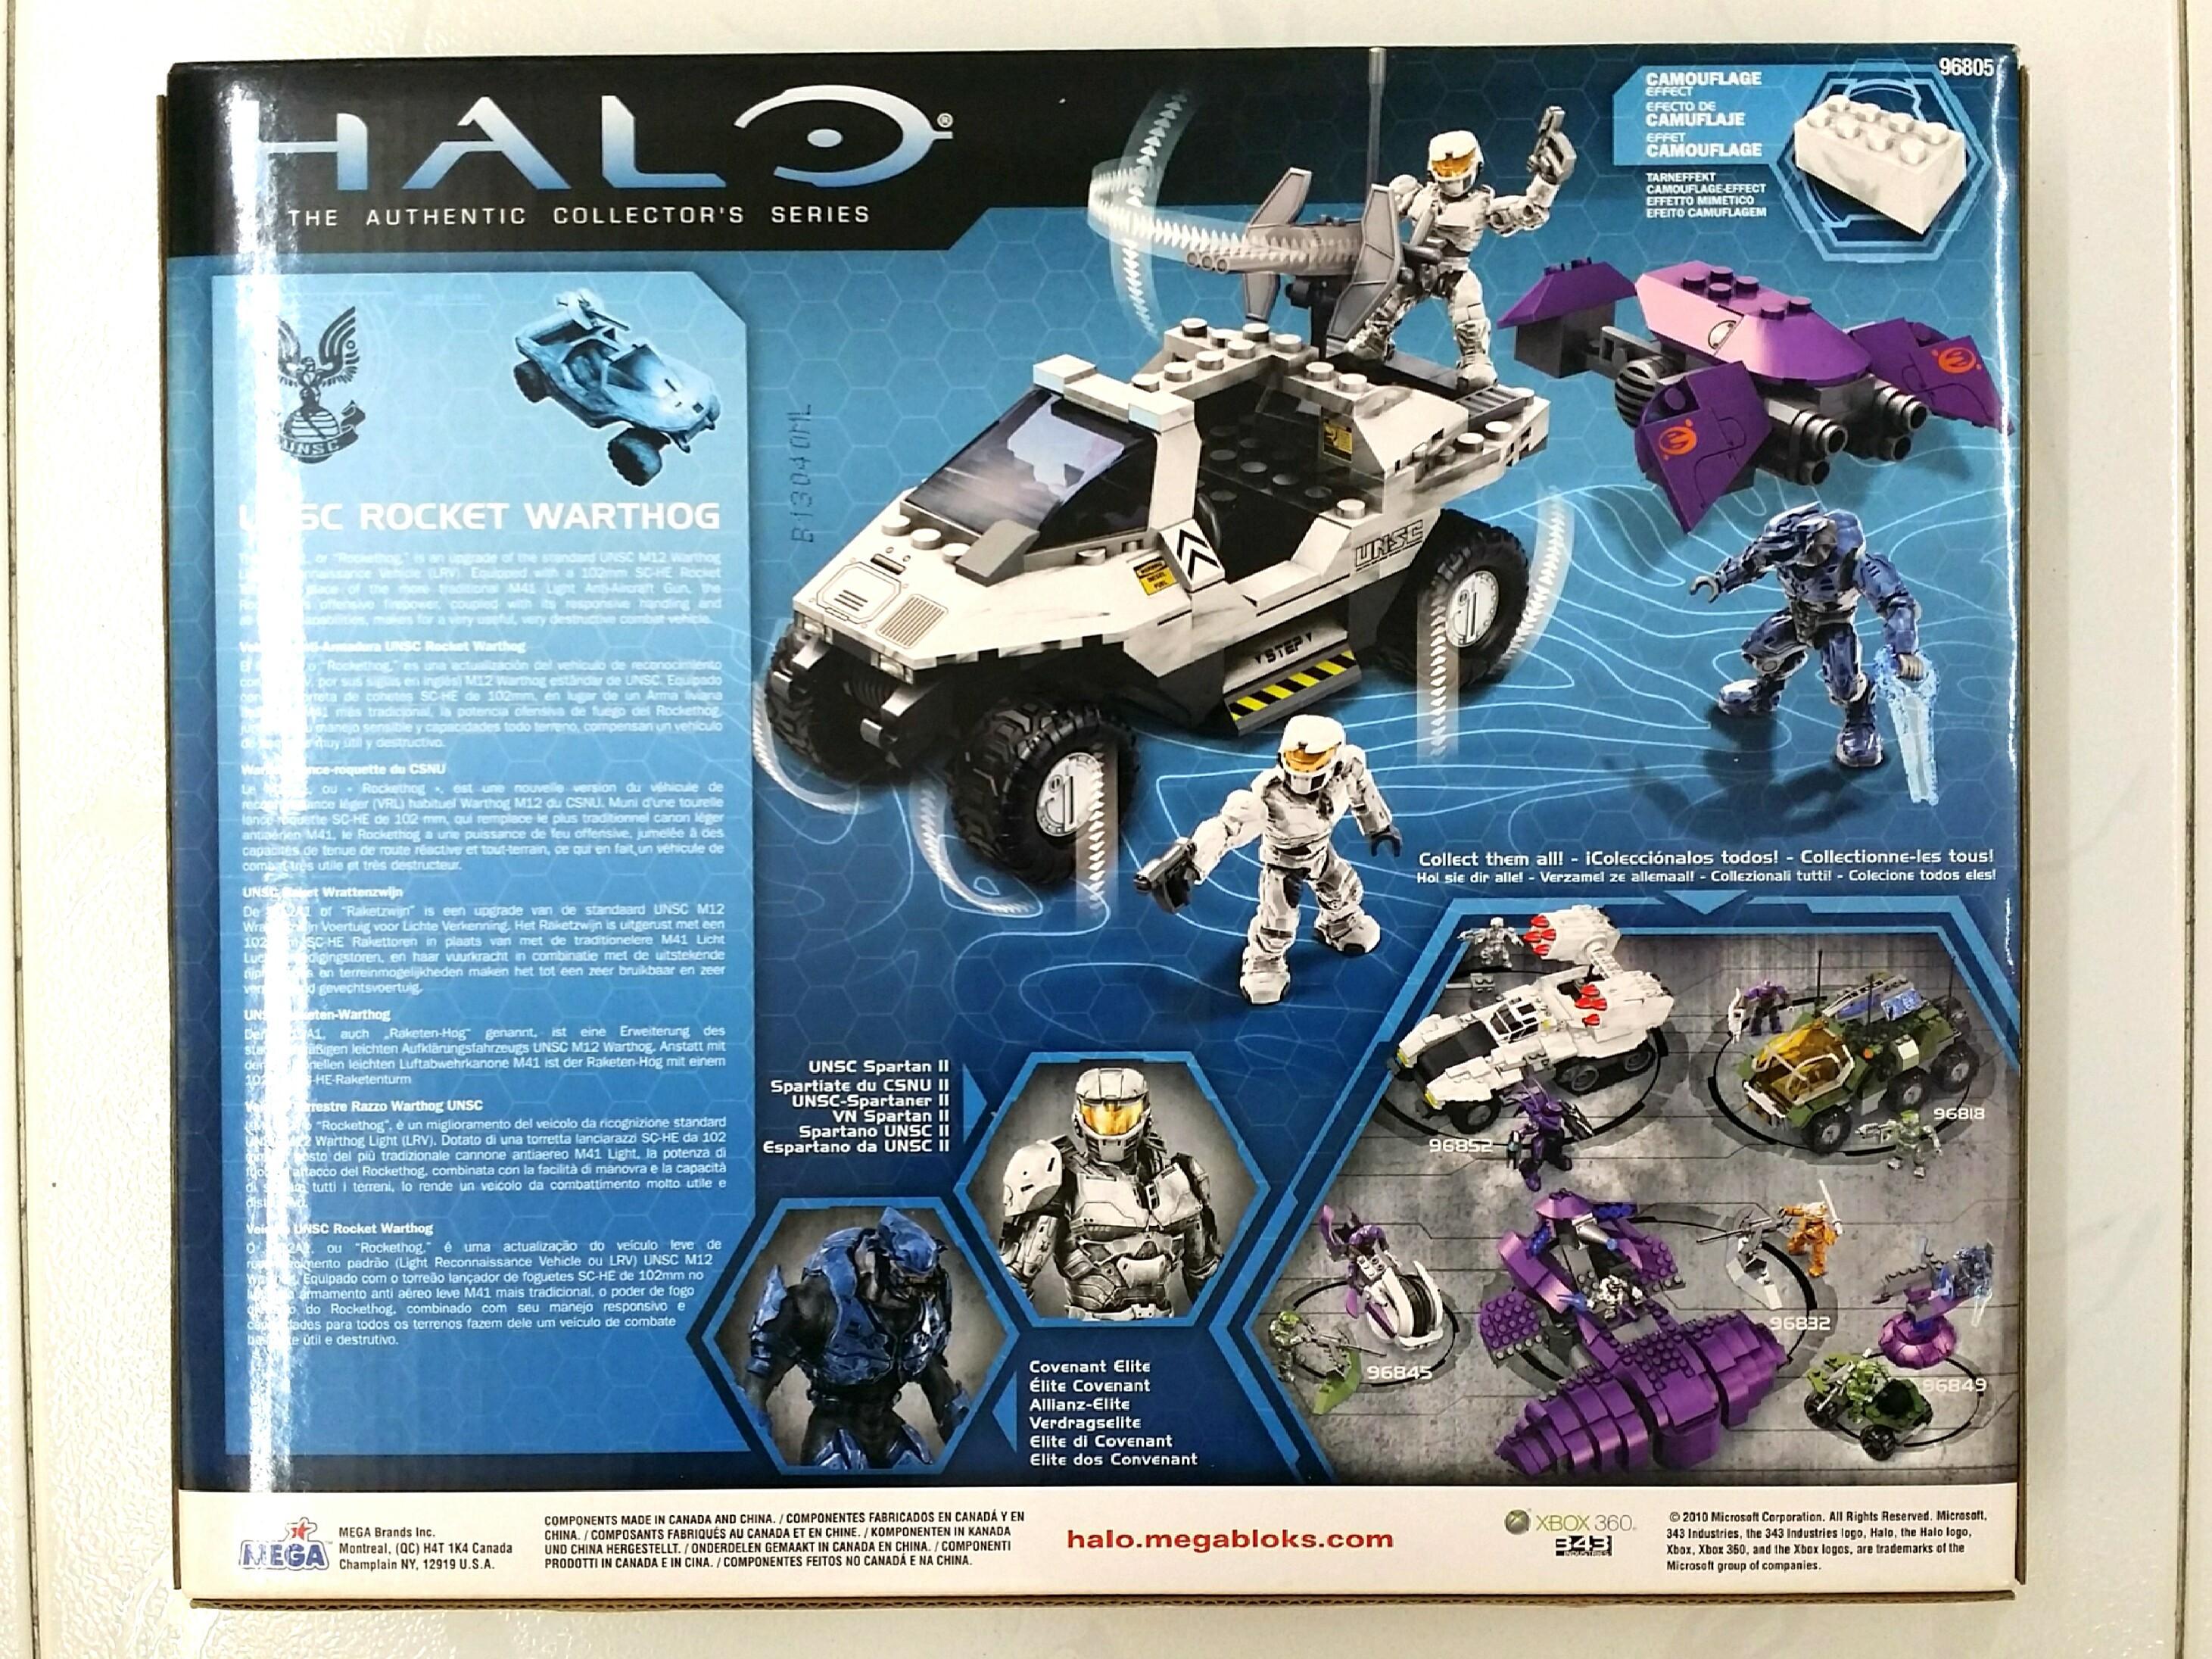 Mega Bloks Halo UNSC Rocket Warthog Set #96805